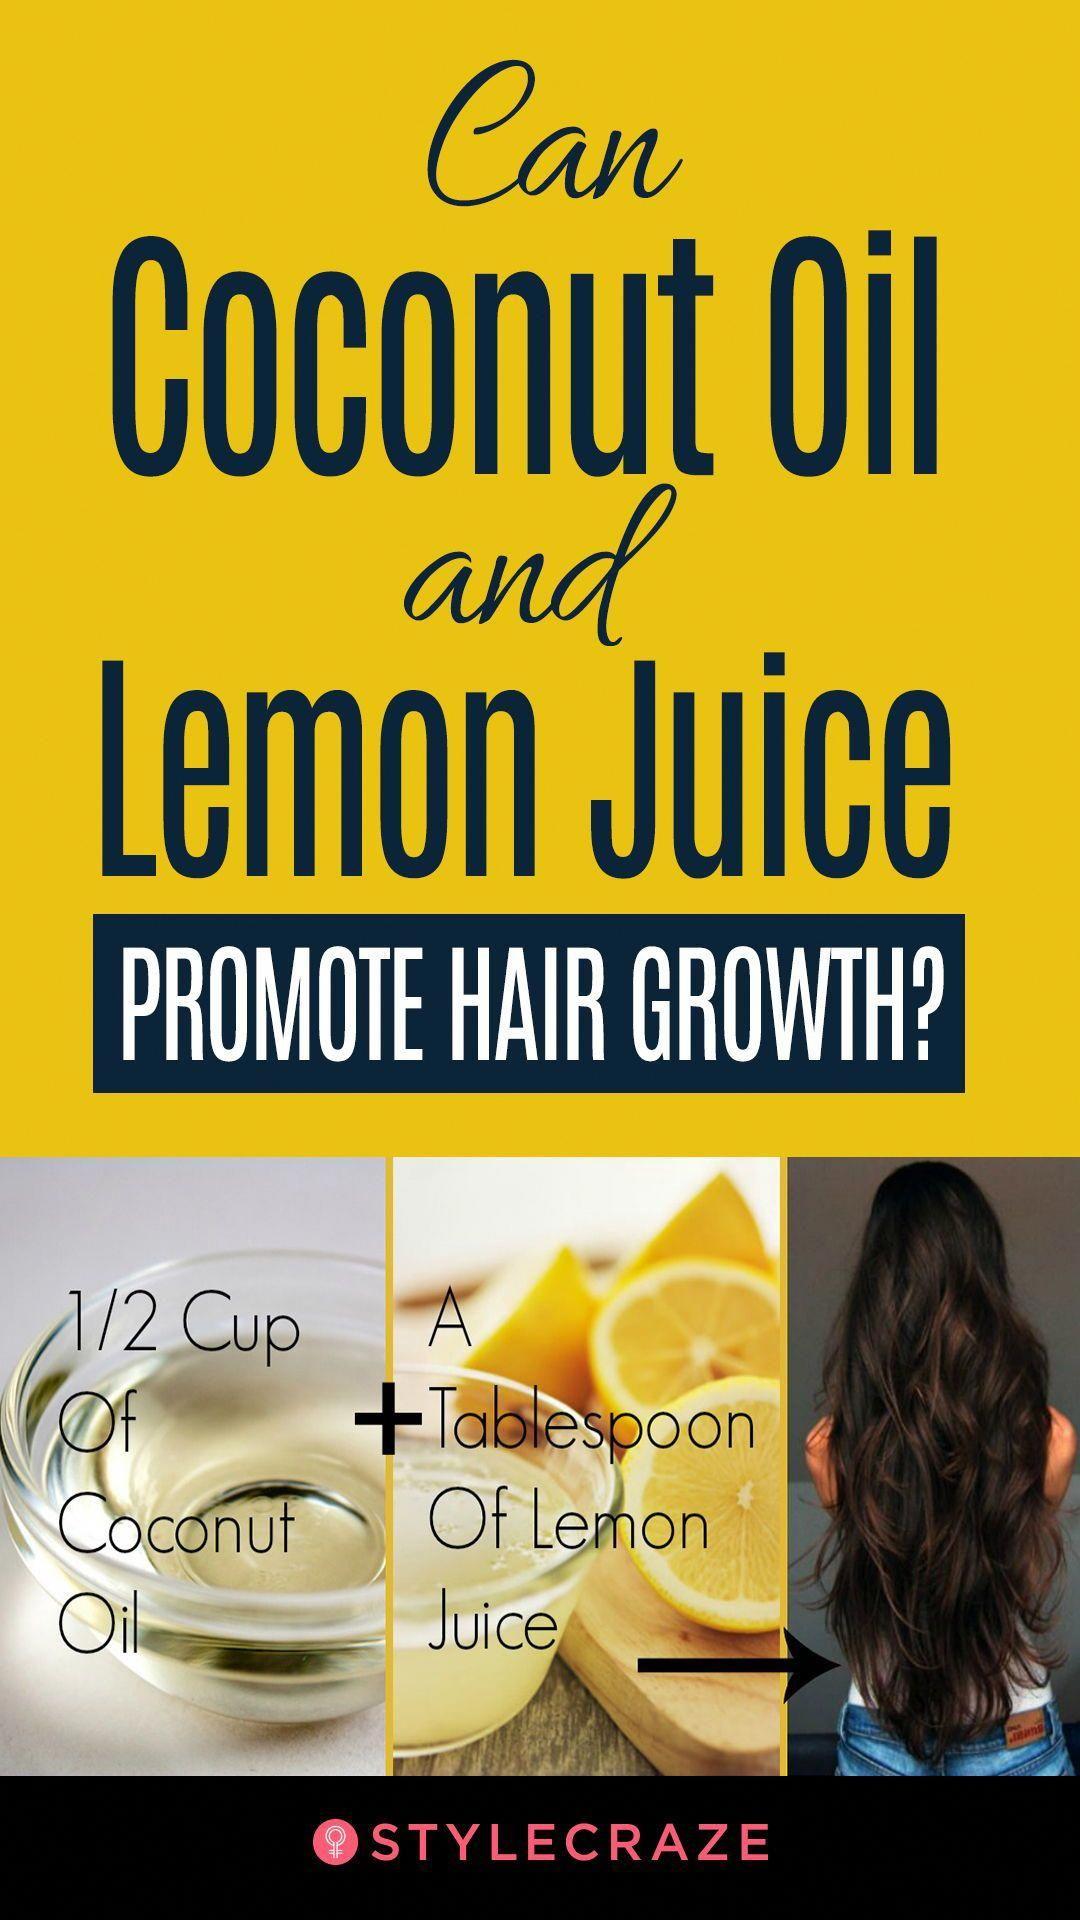 Coconut oil and lemon juice for hair growth haircare